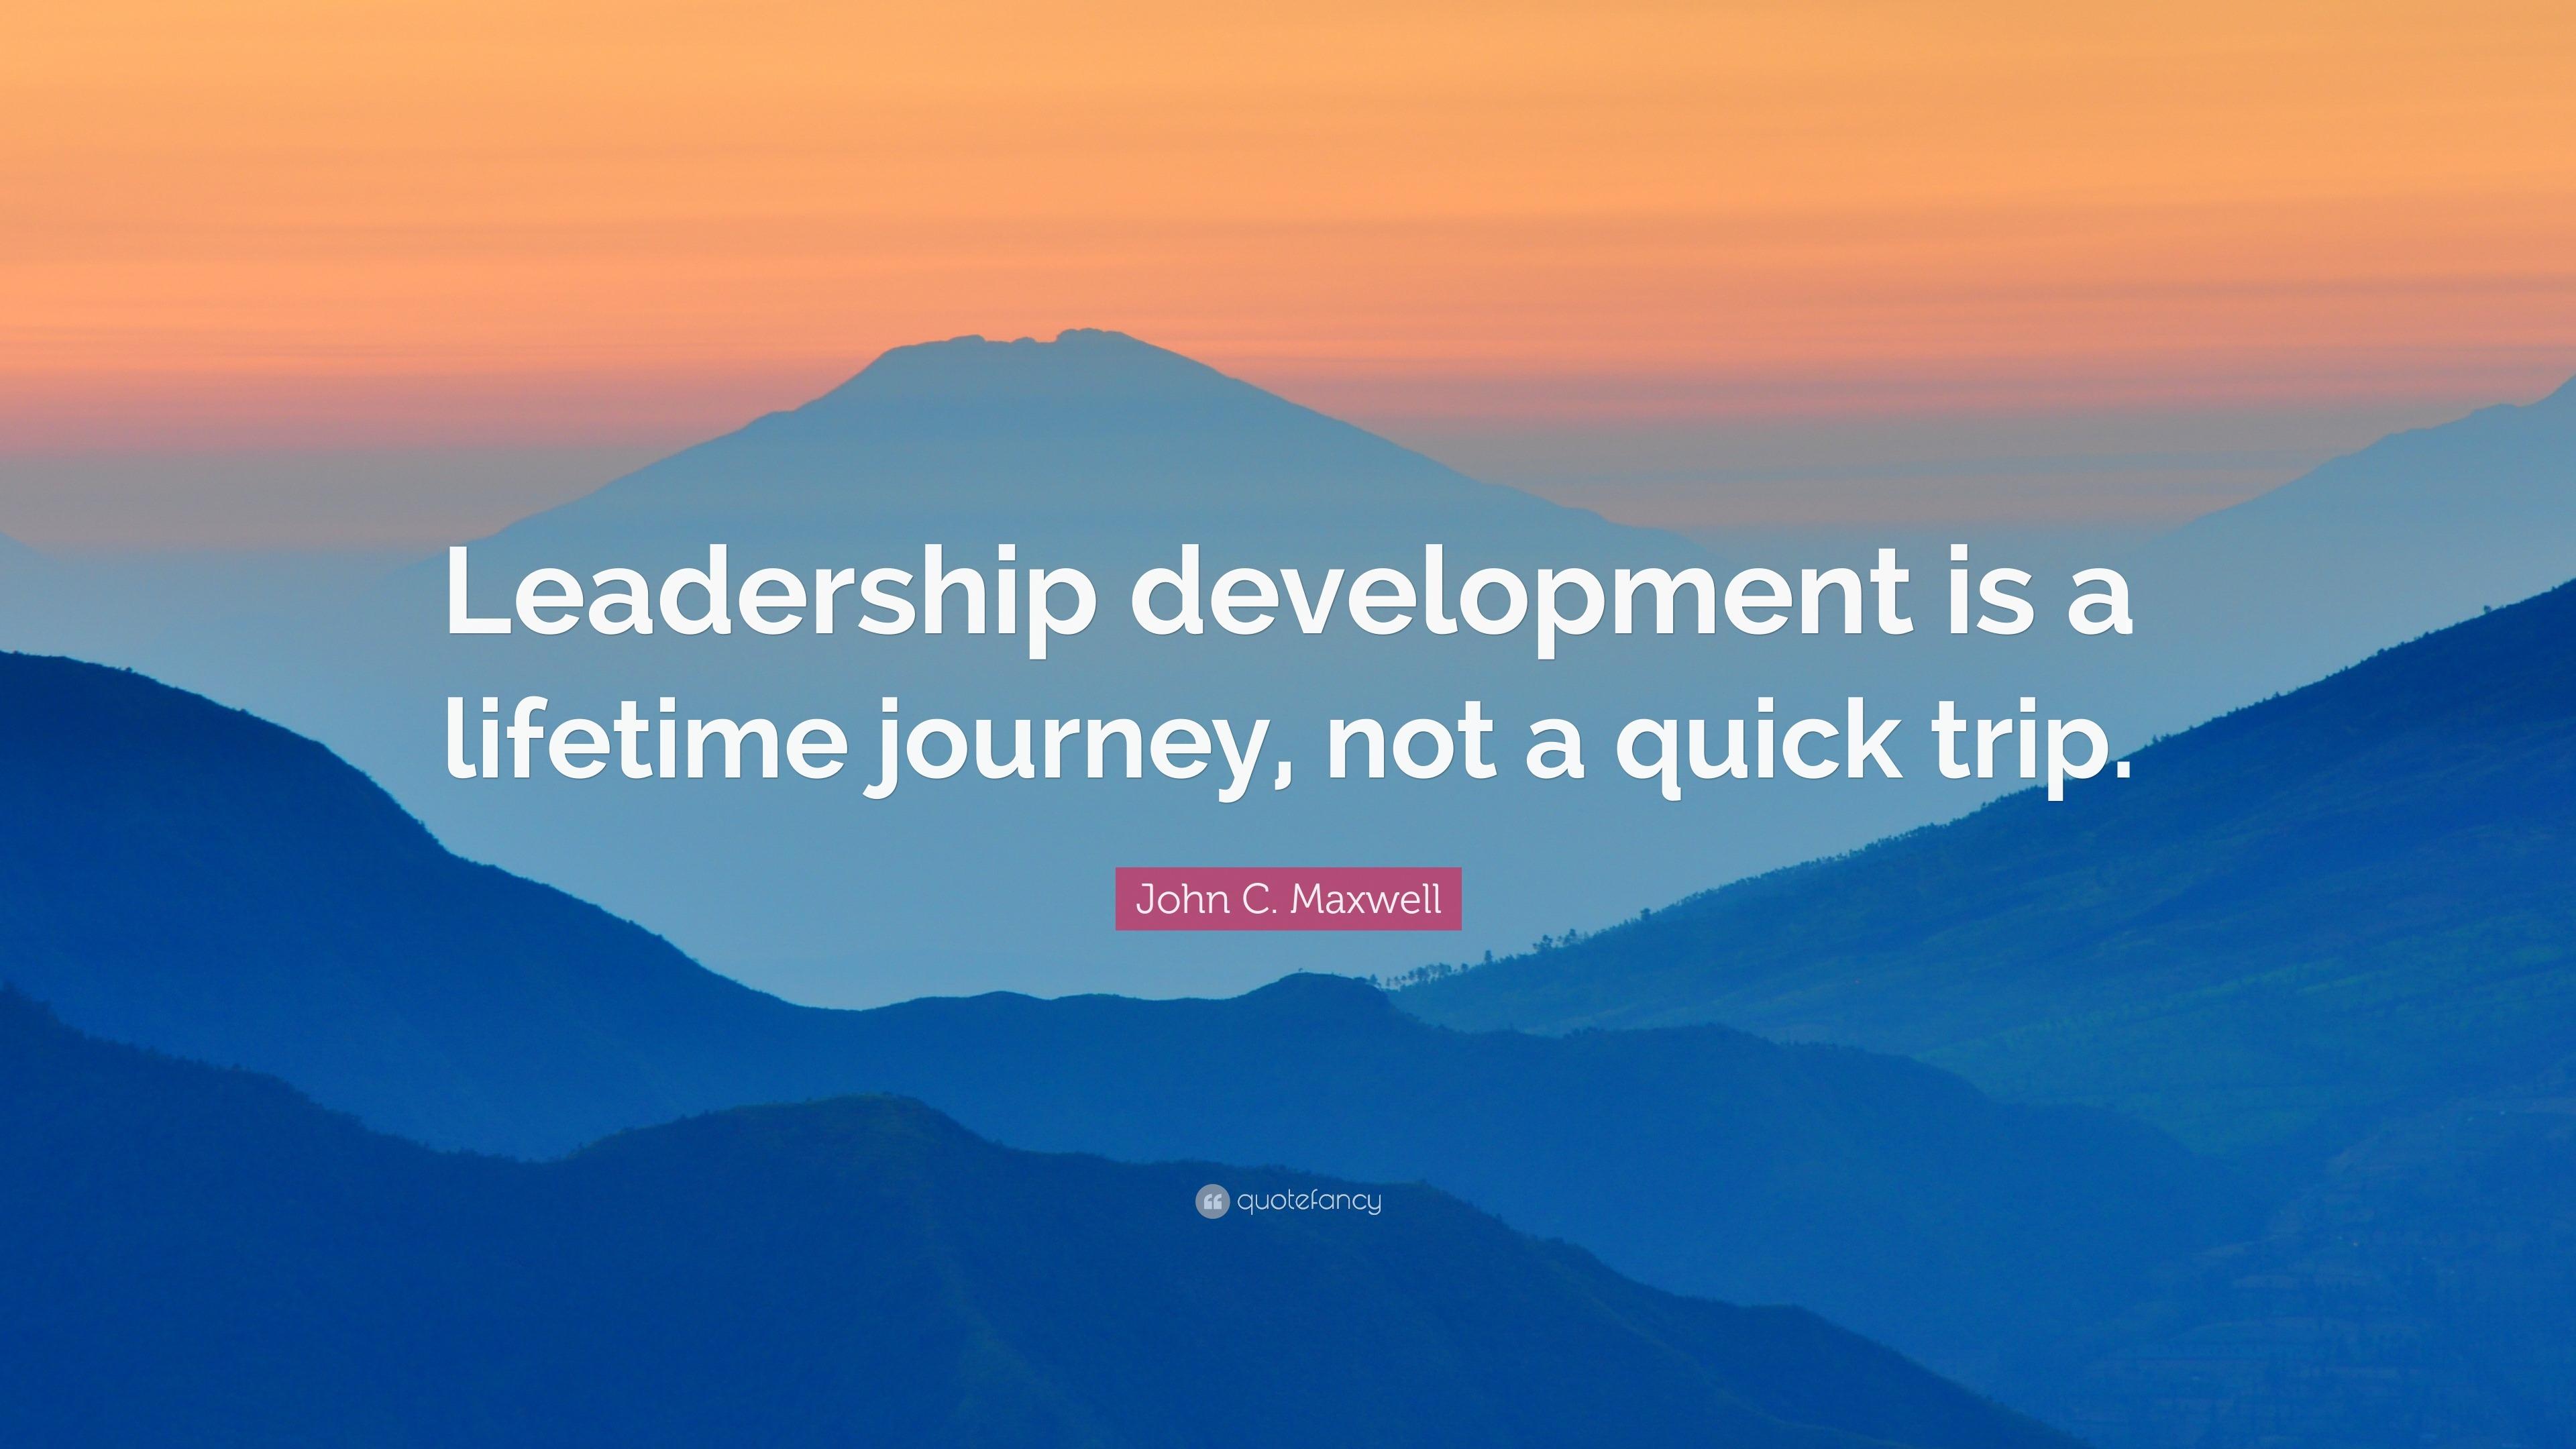 John C Maxwell Quote Leadership Development Is A Lifetime Journey